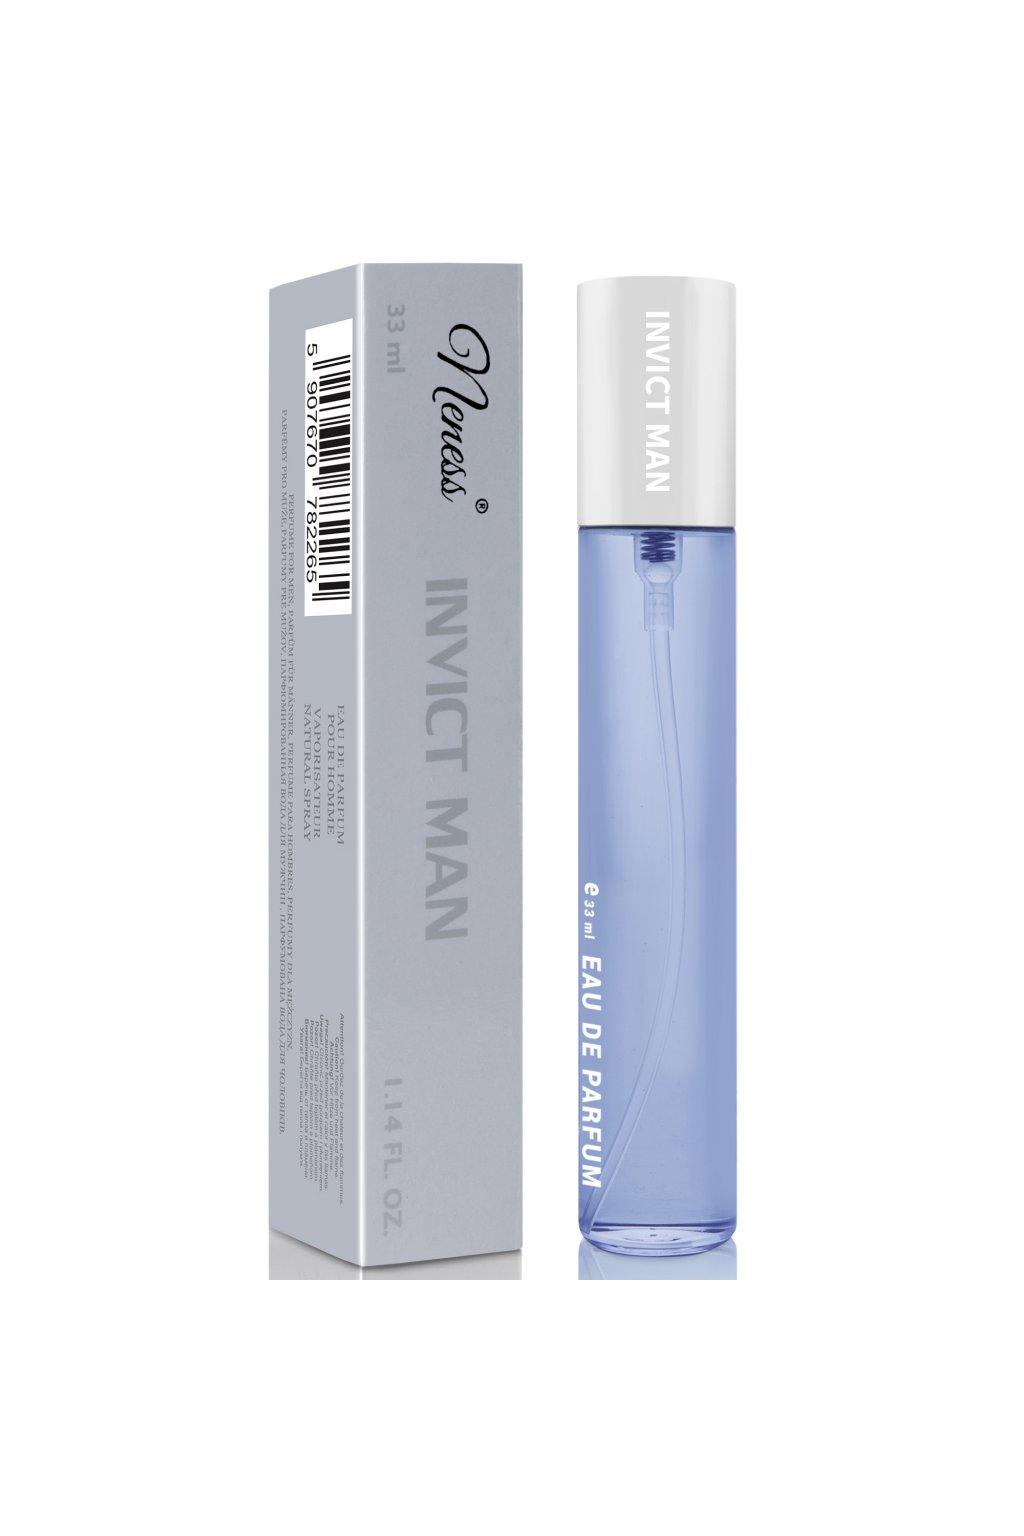 N175 man invictus parfemovana voda pro muze 33 ml